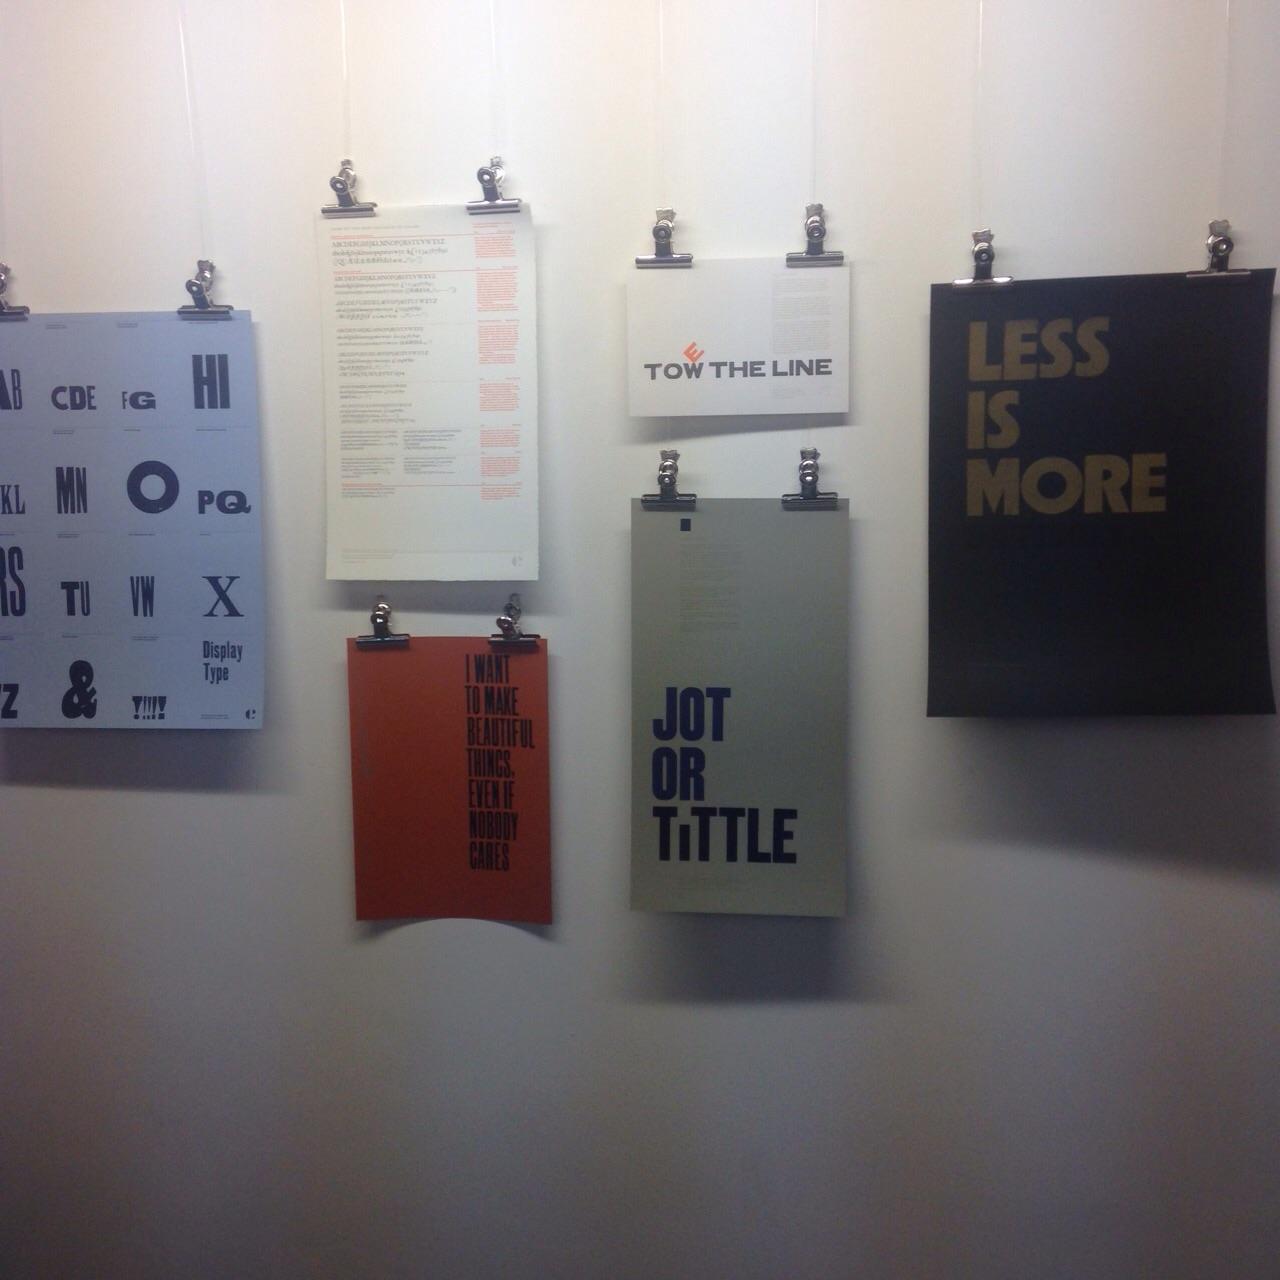 Leeds Print Festival Marvellous digital marketing agency